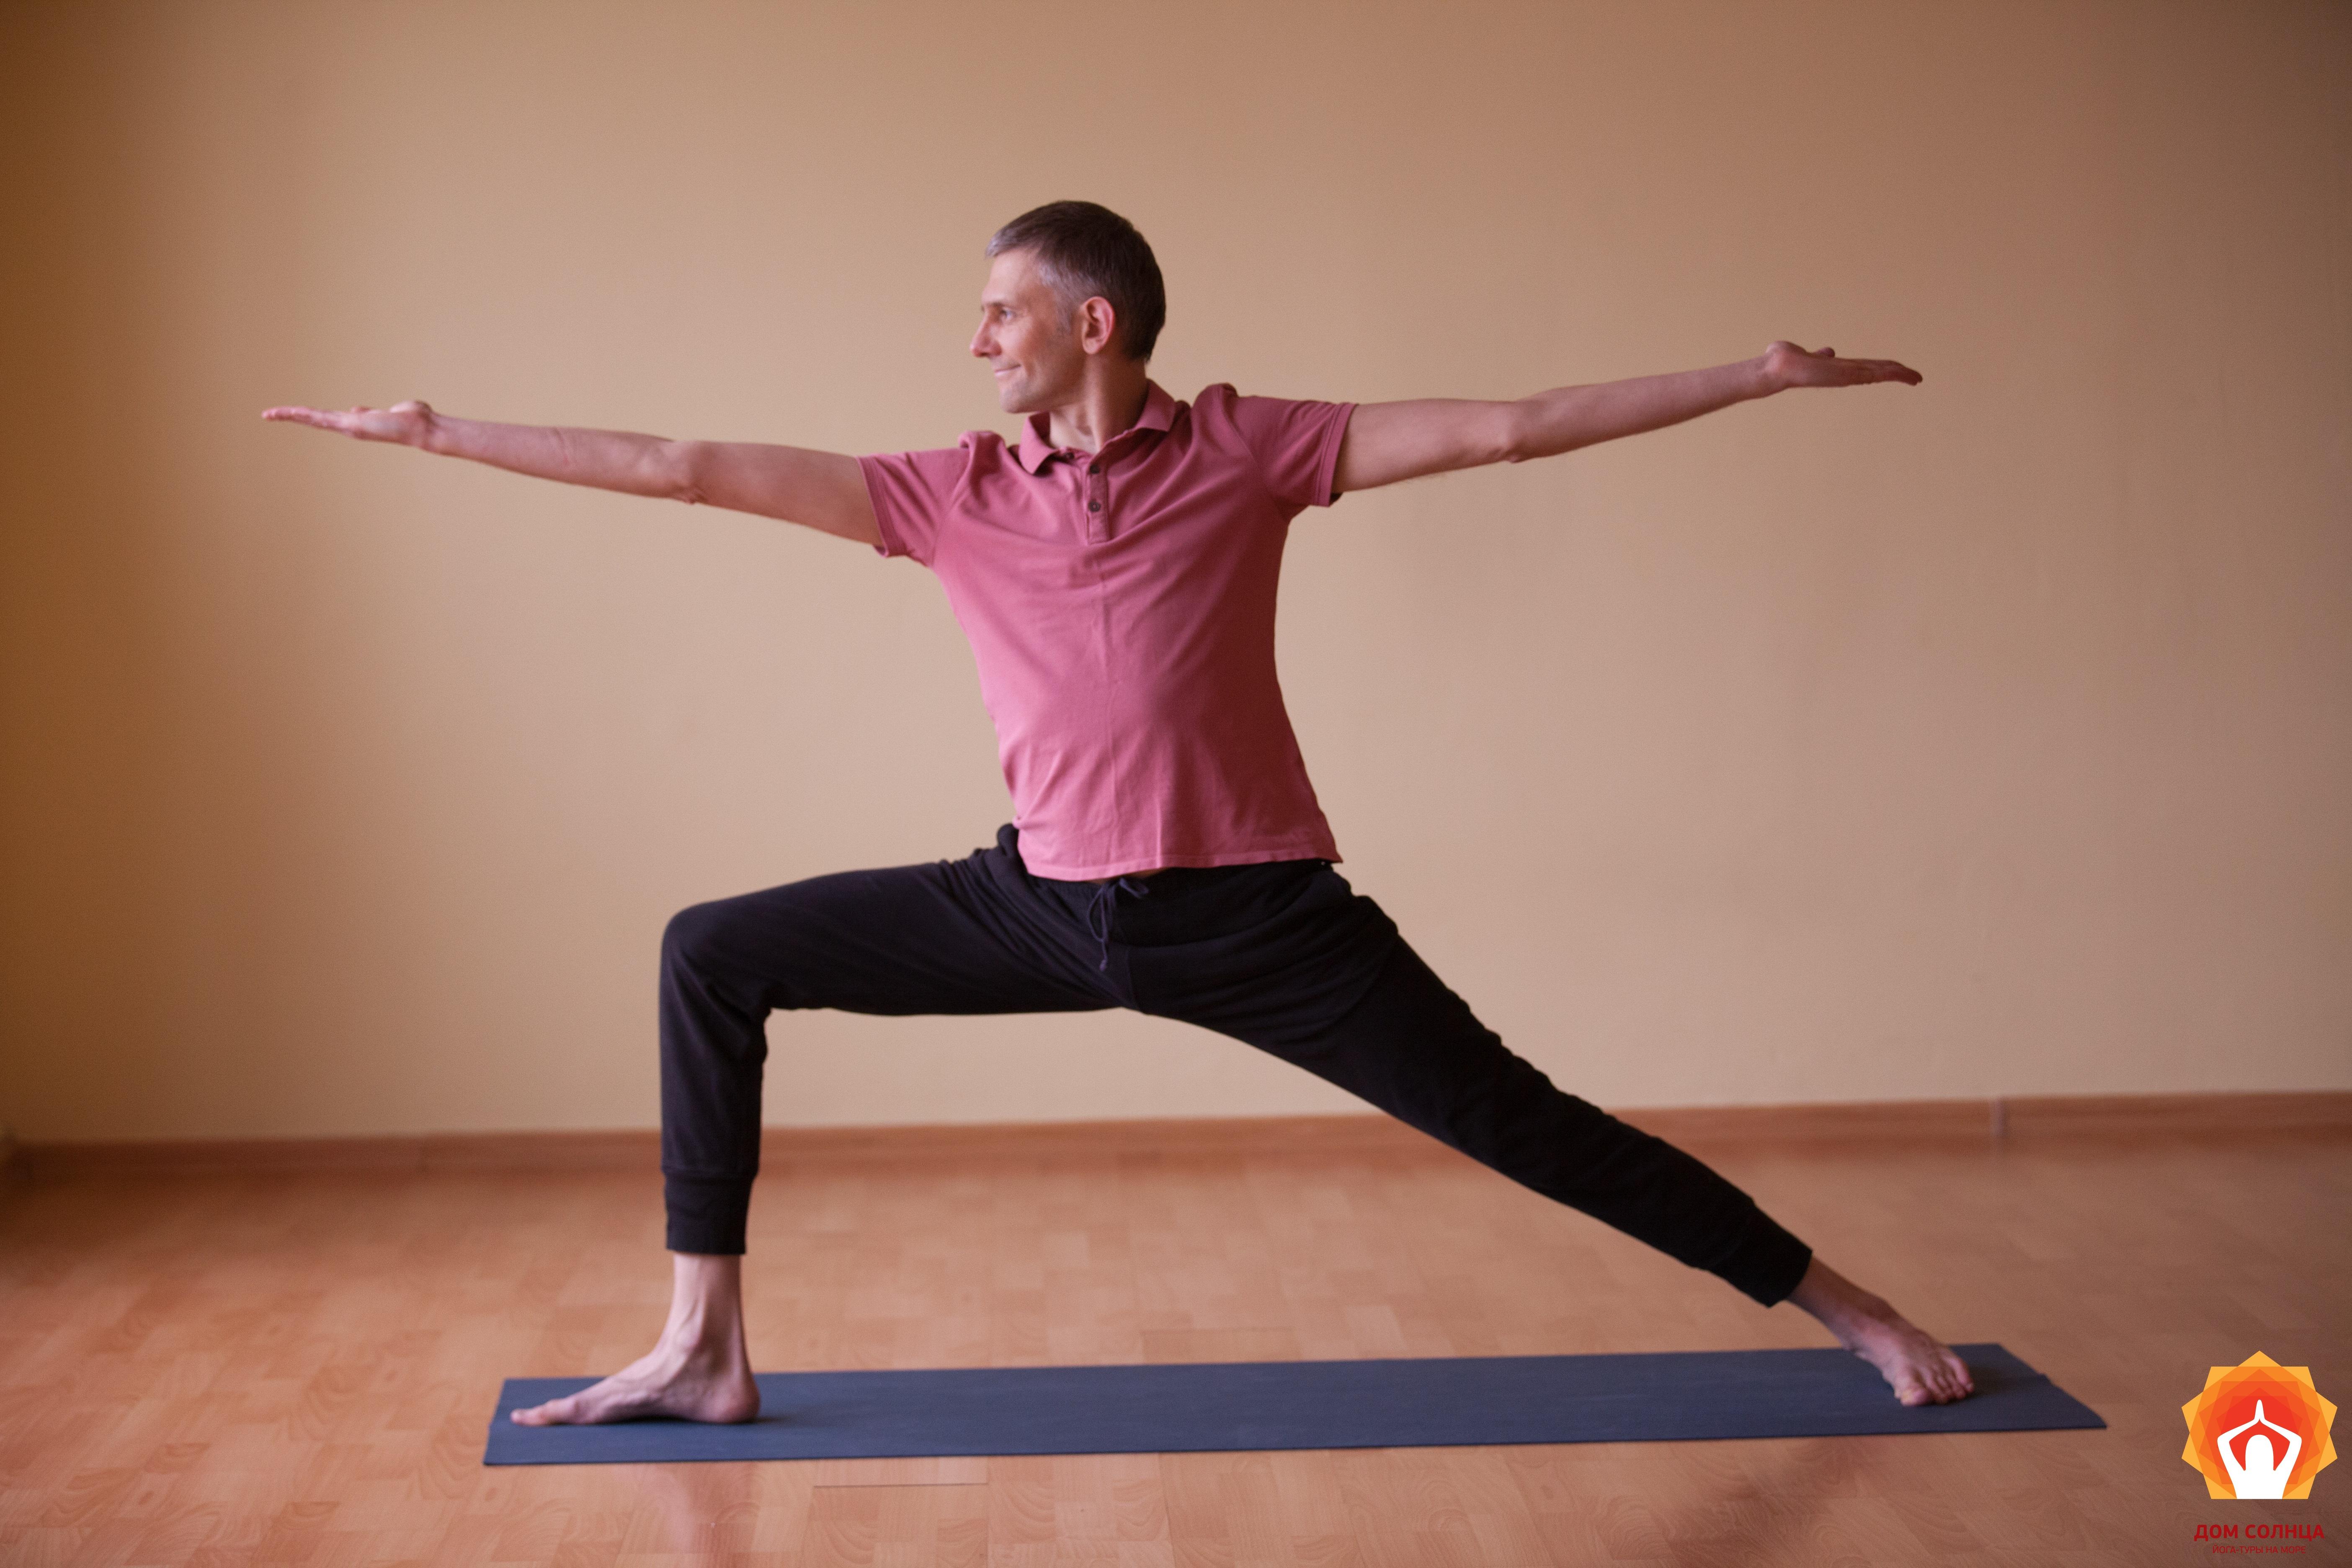 Йога студия практика в волгограде